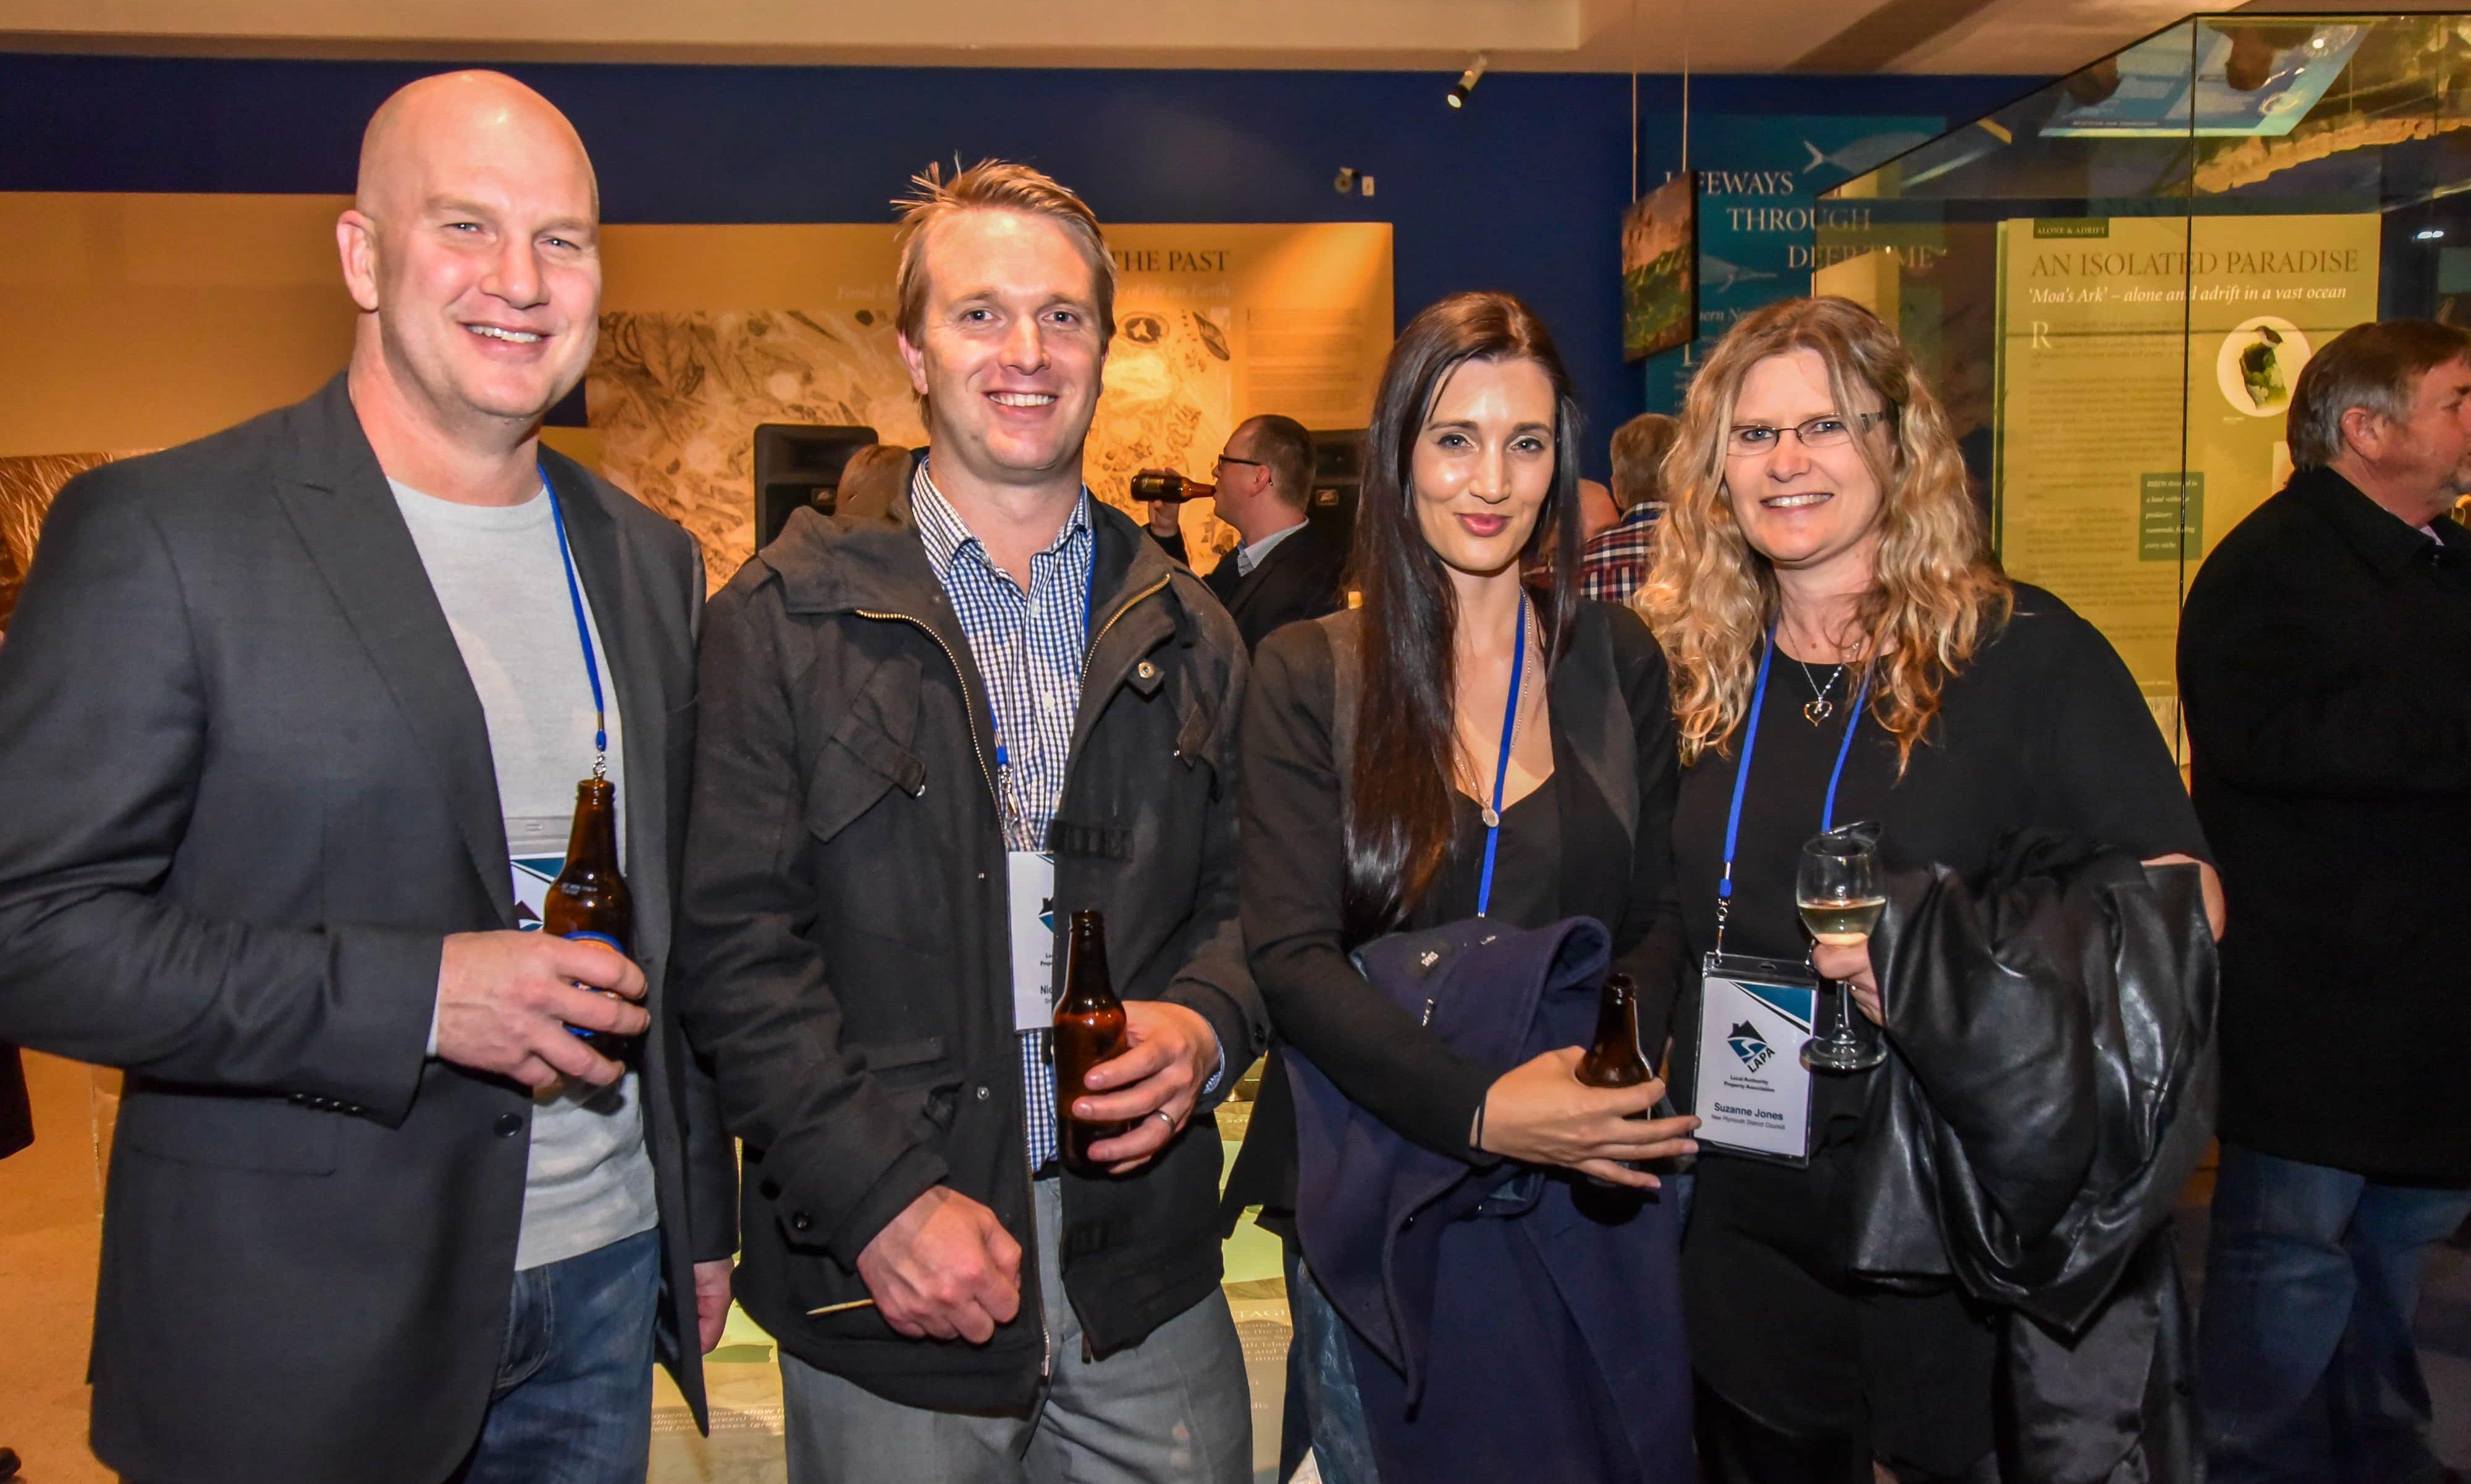 2015 LAPA Conference. Dunedin, New Zealand, 4-6 November 2015. Photo: Chris Sullivan